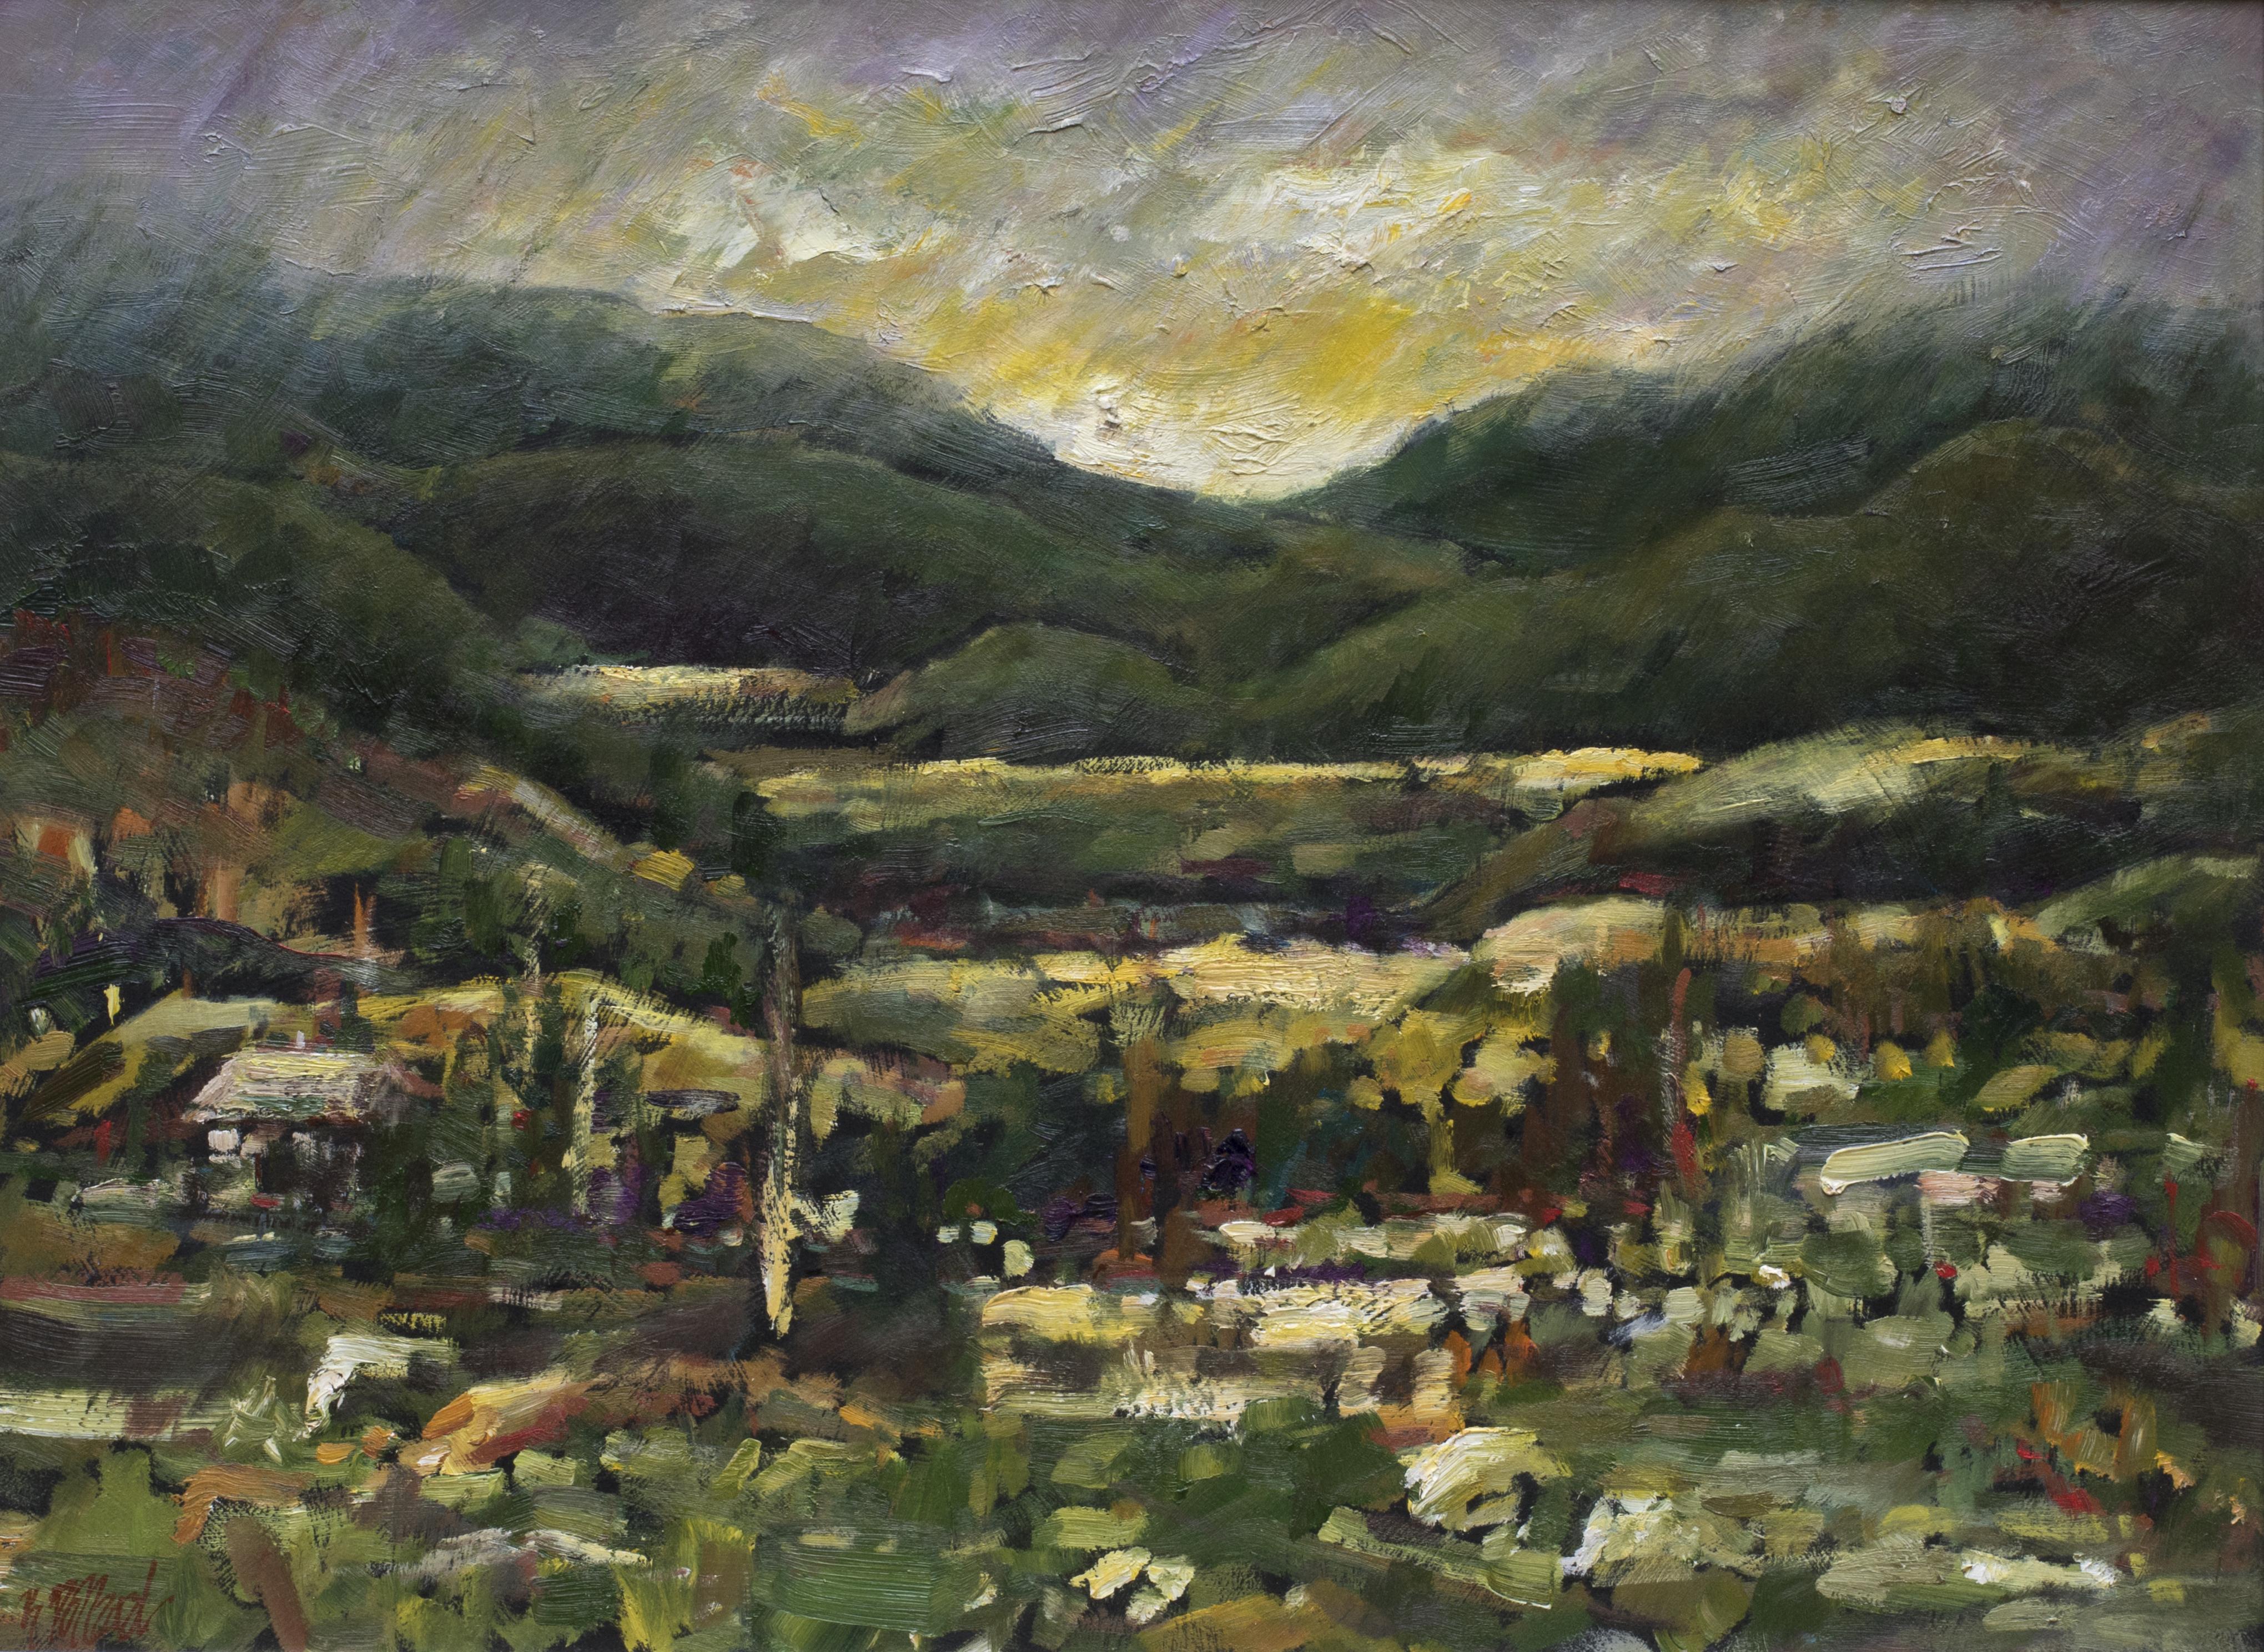 Stuart's Valley   Landscape Paintings   Artist   Kim Pollard   Canadian Artist   Canadian Art